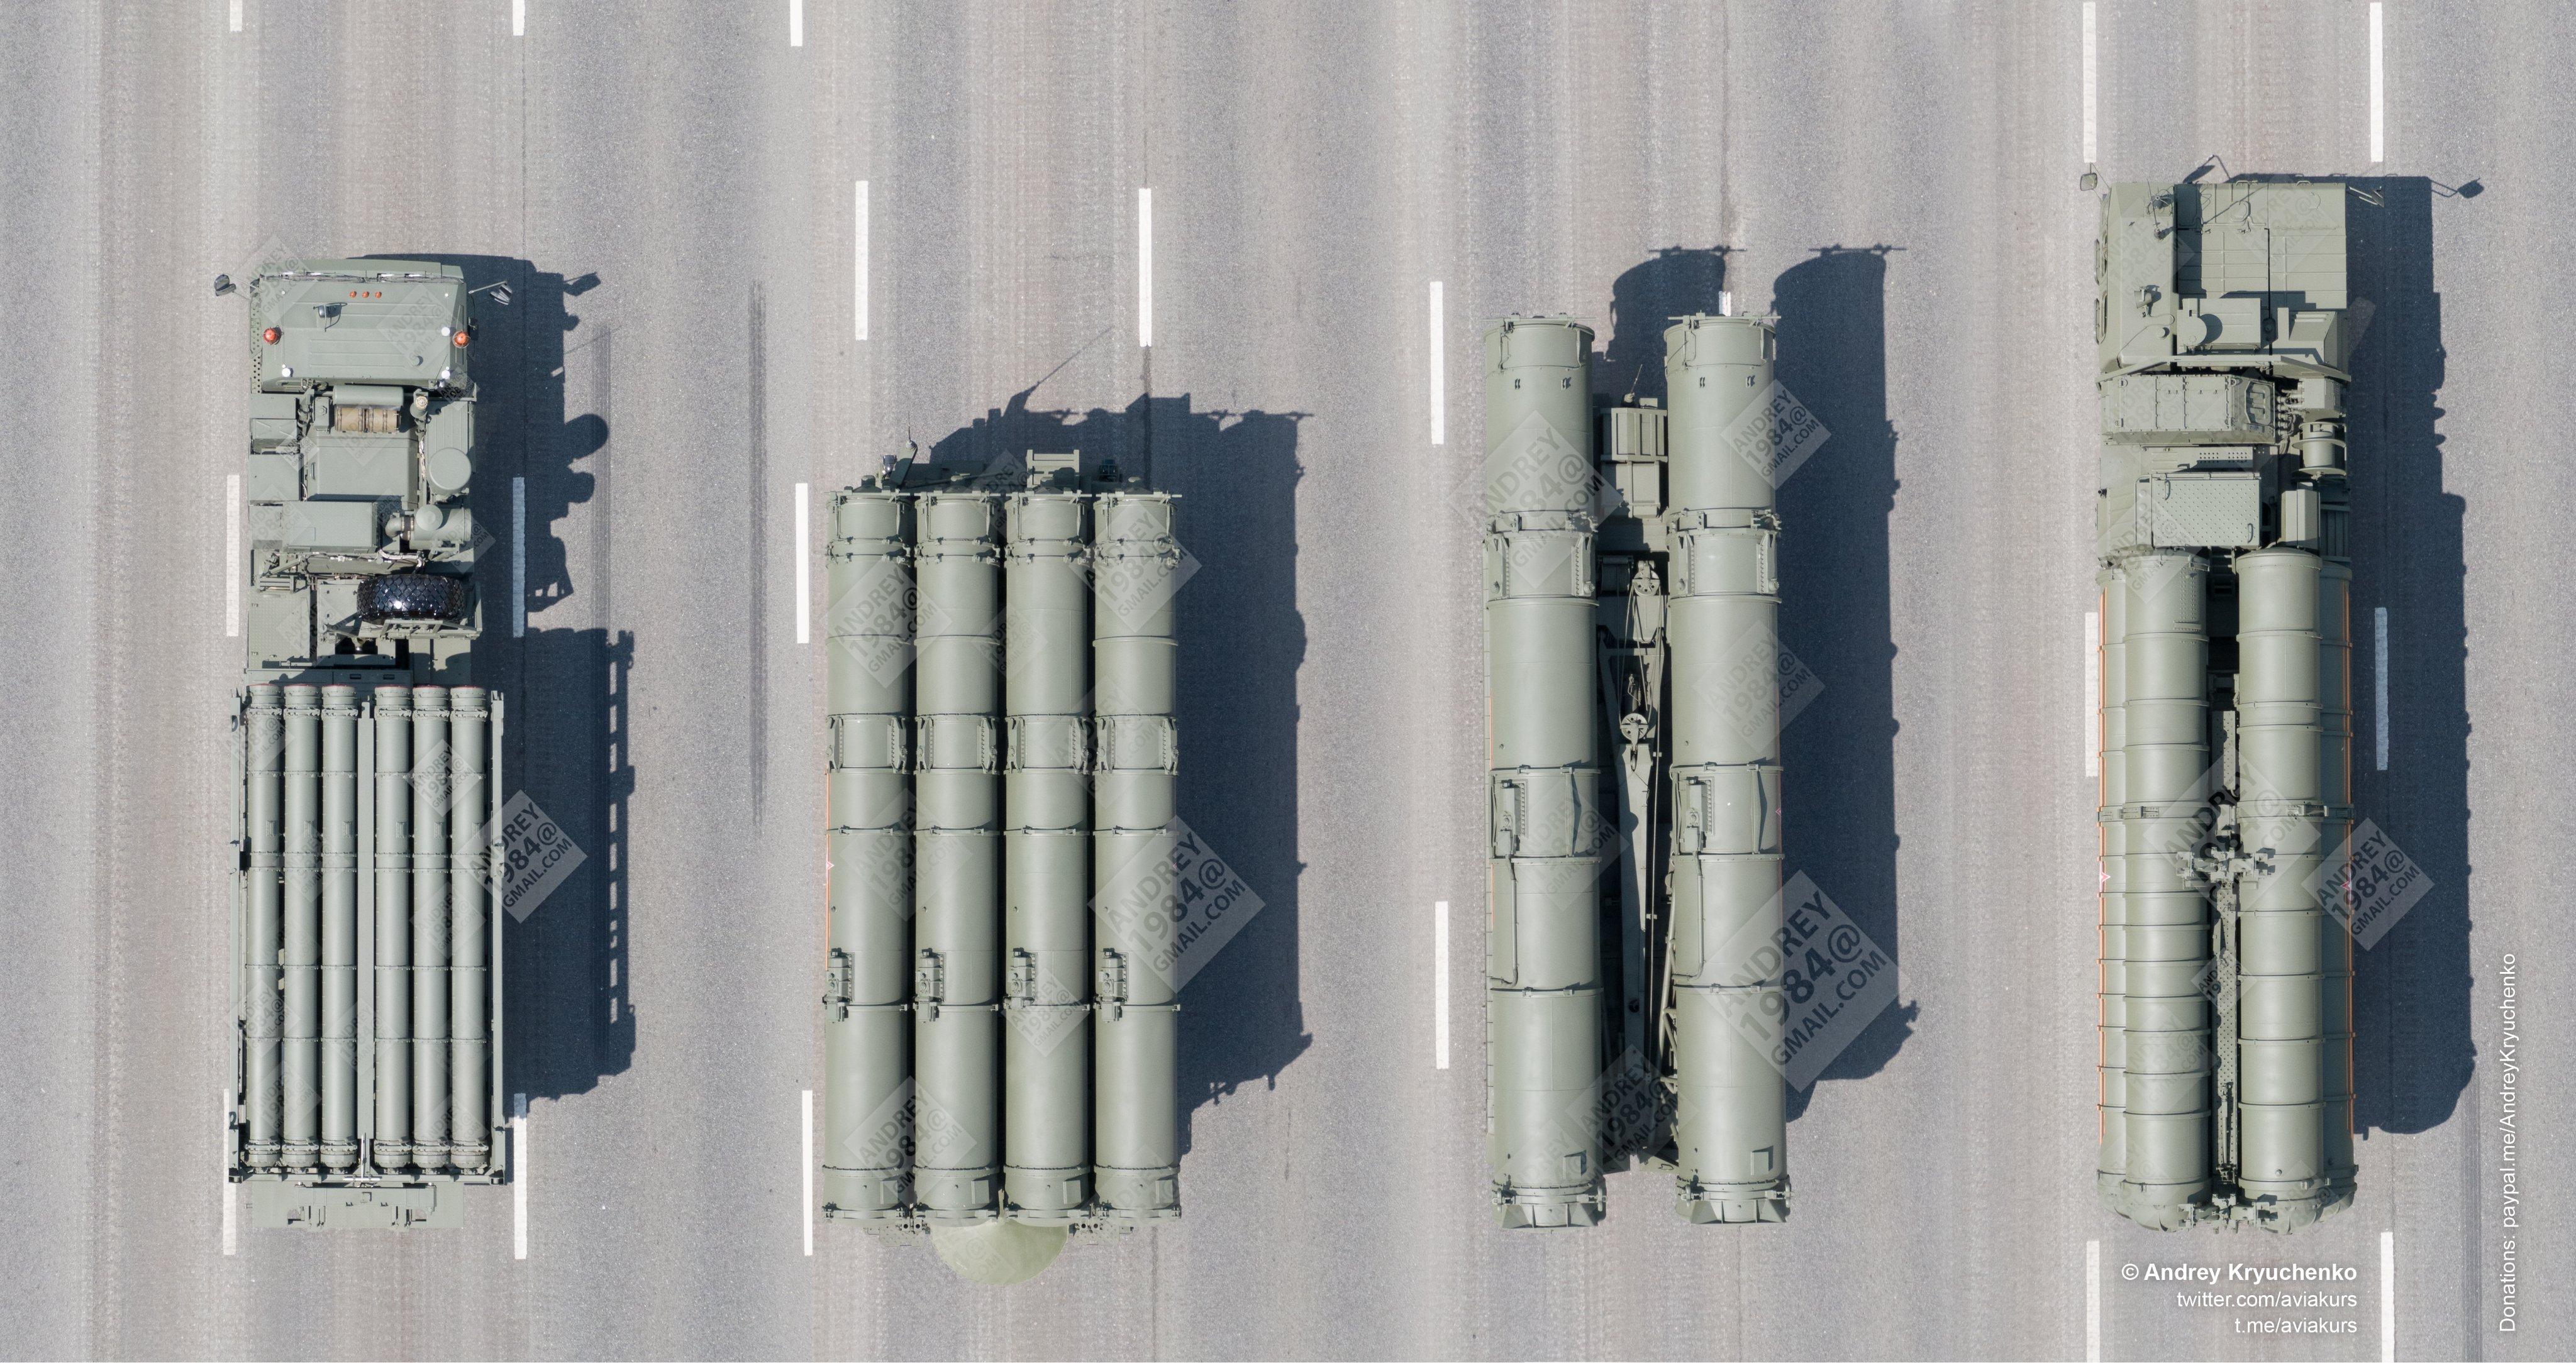 S-300/400/500 News [Russian Strategic Air Defense] #3 - Page 27 EcAx0h8WAAMxRTx?format=jpg&name=4096x4096